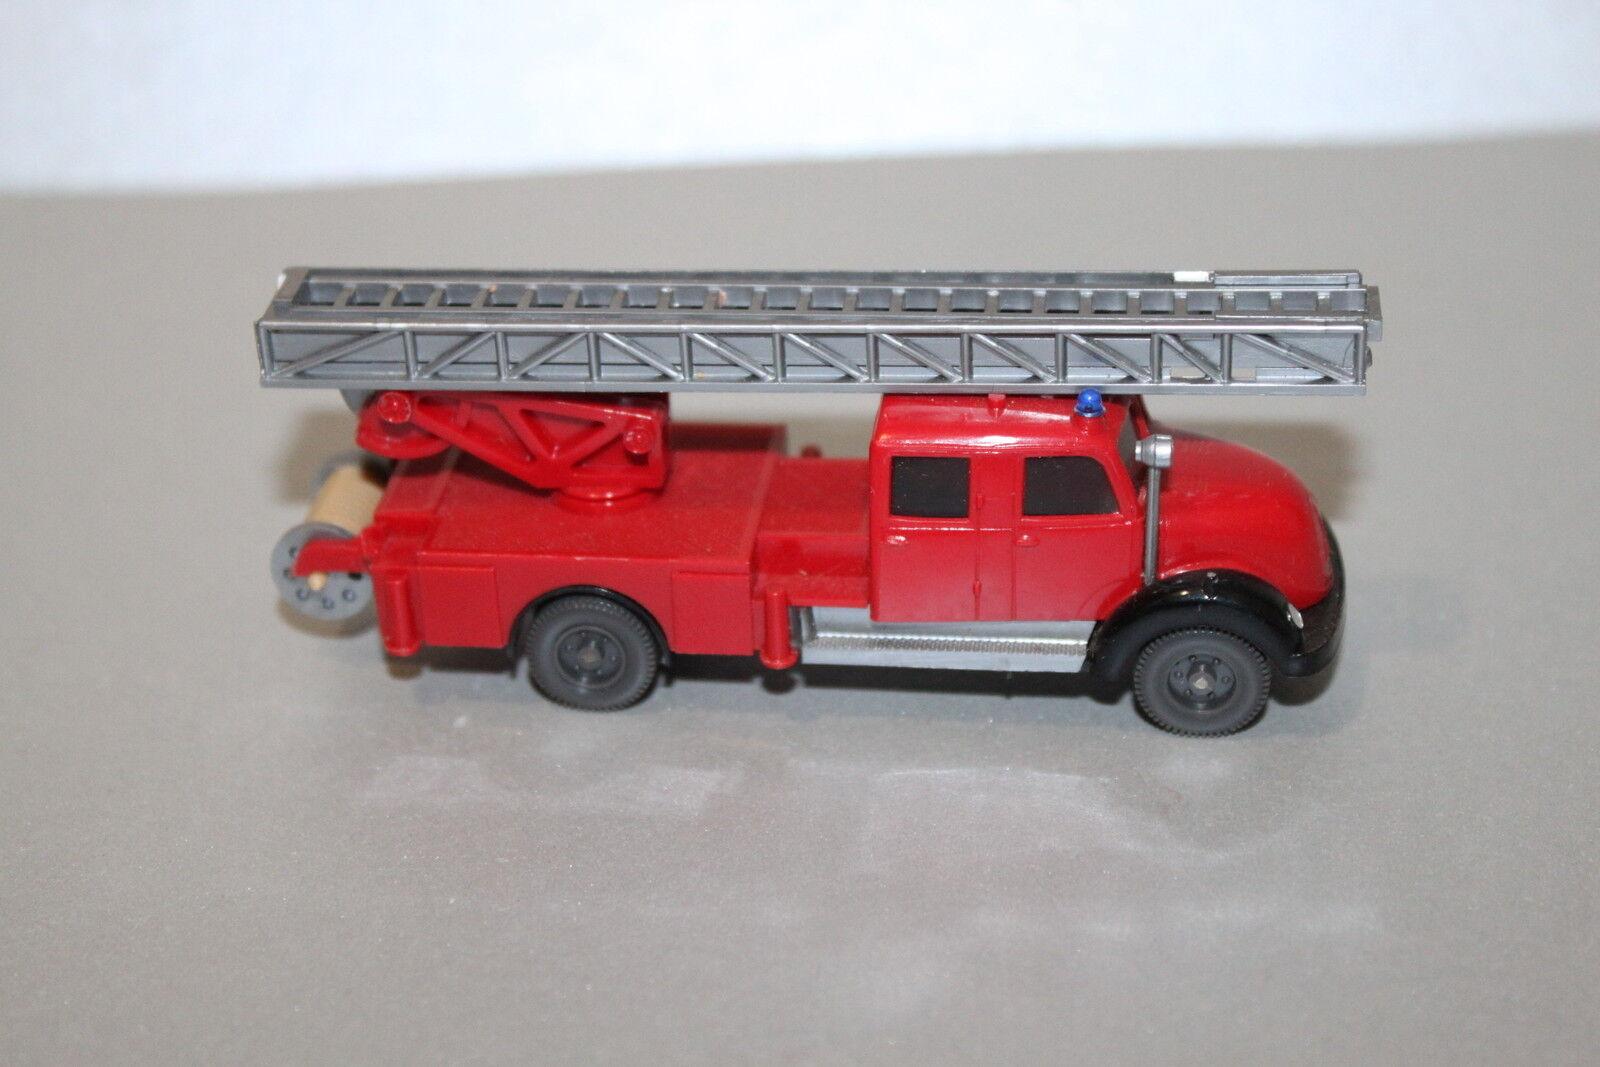 Wiking 620 35 MAGIRUS sirius rondhauber pompiers chef voiture piste  h0  authentique en ligne